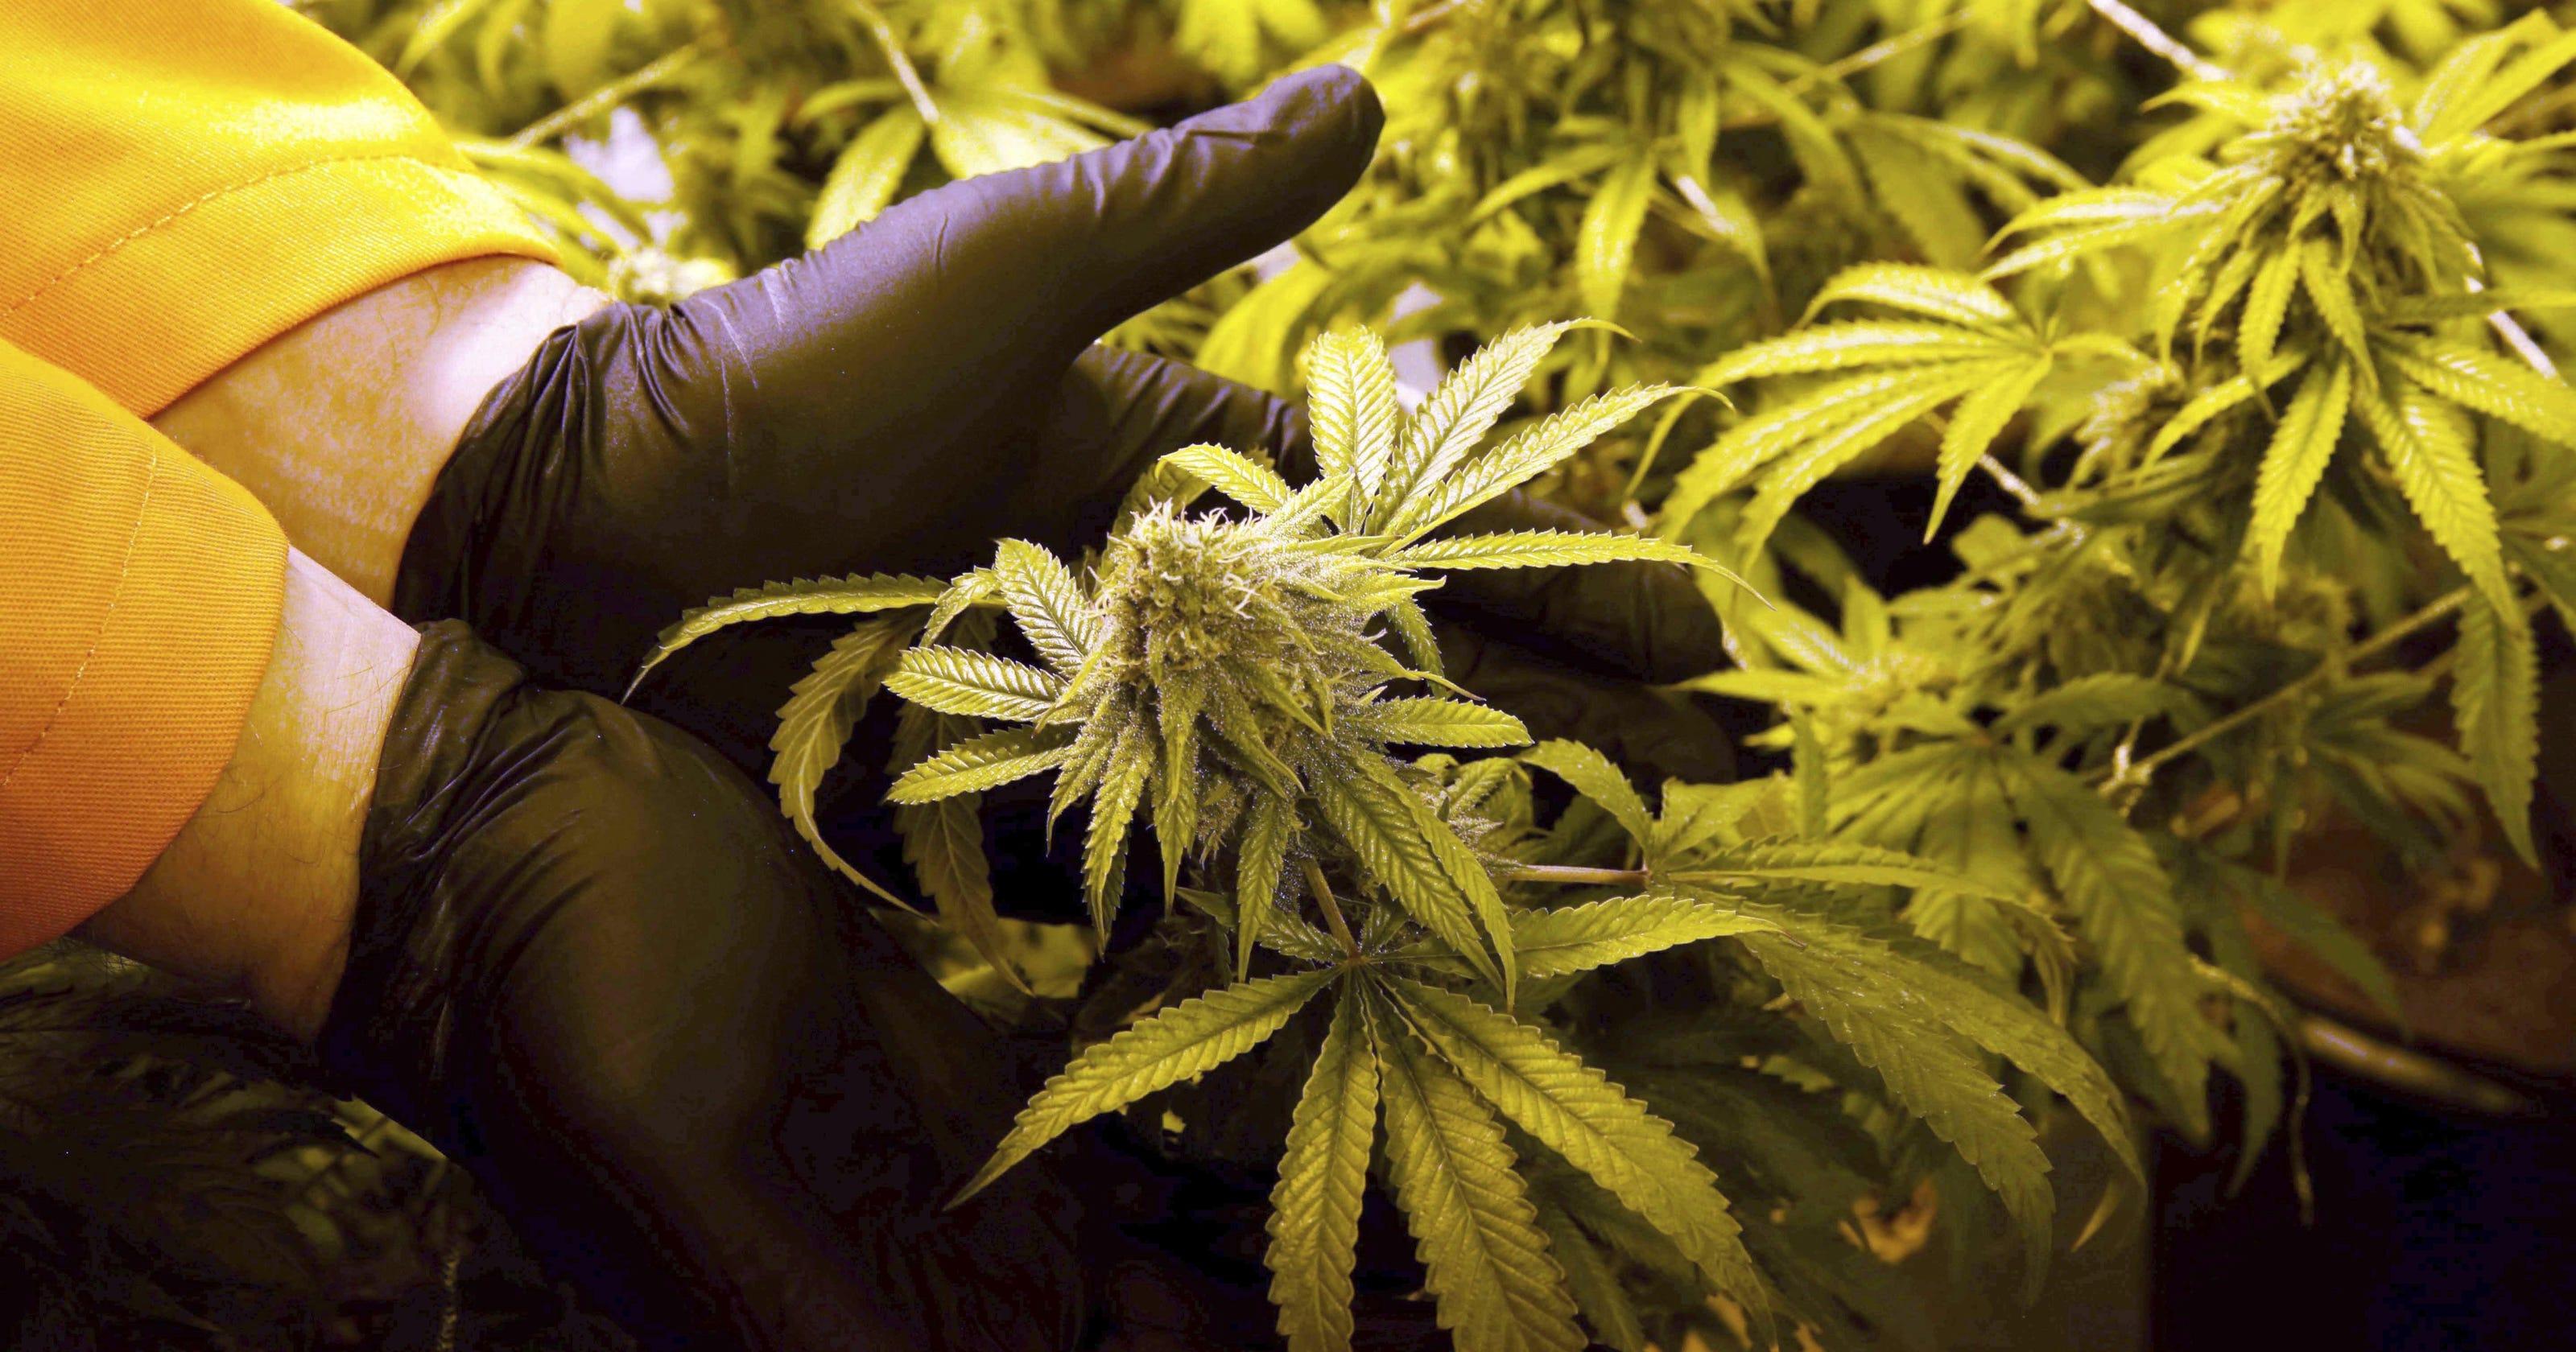 Florida medical marijuana: DeSantis could change approach to